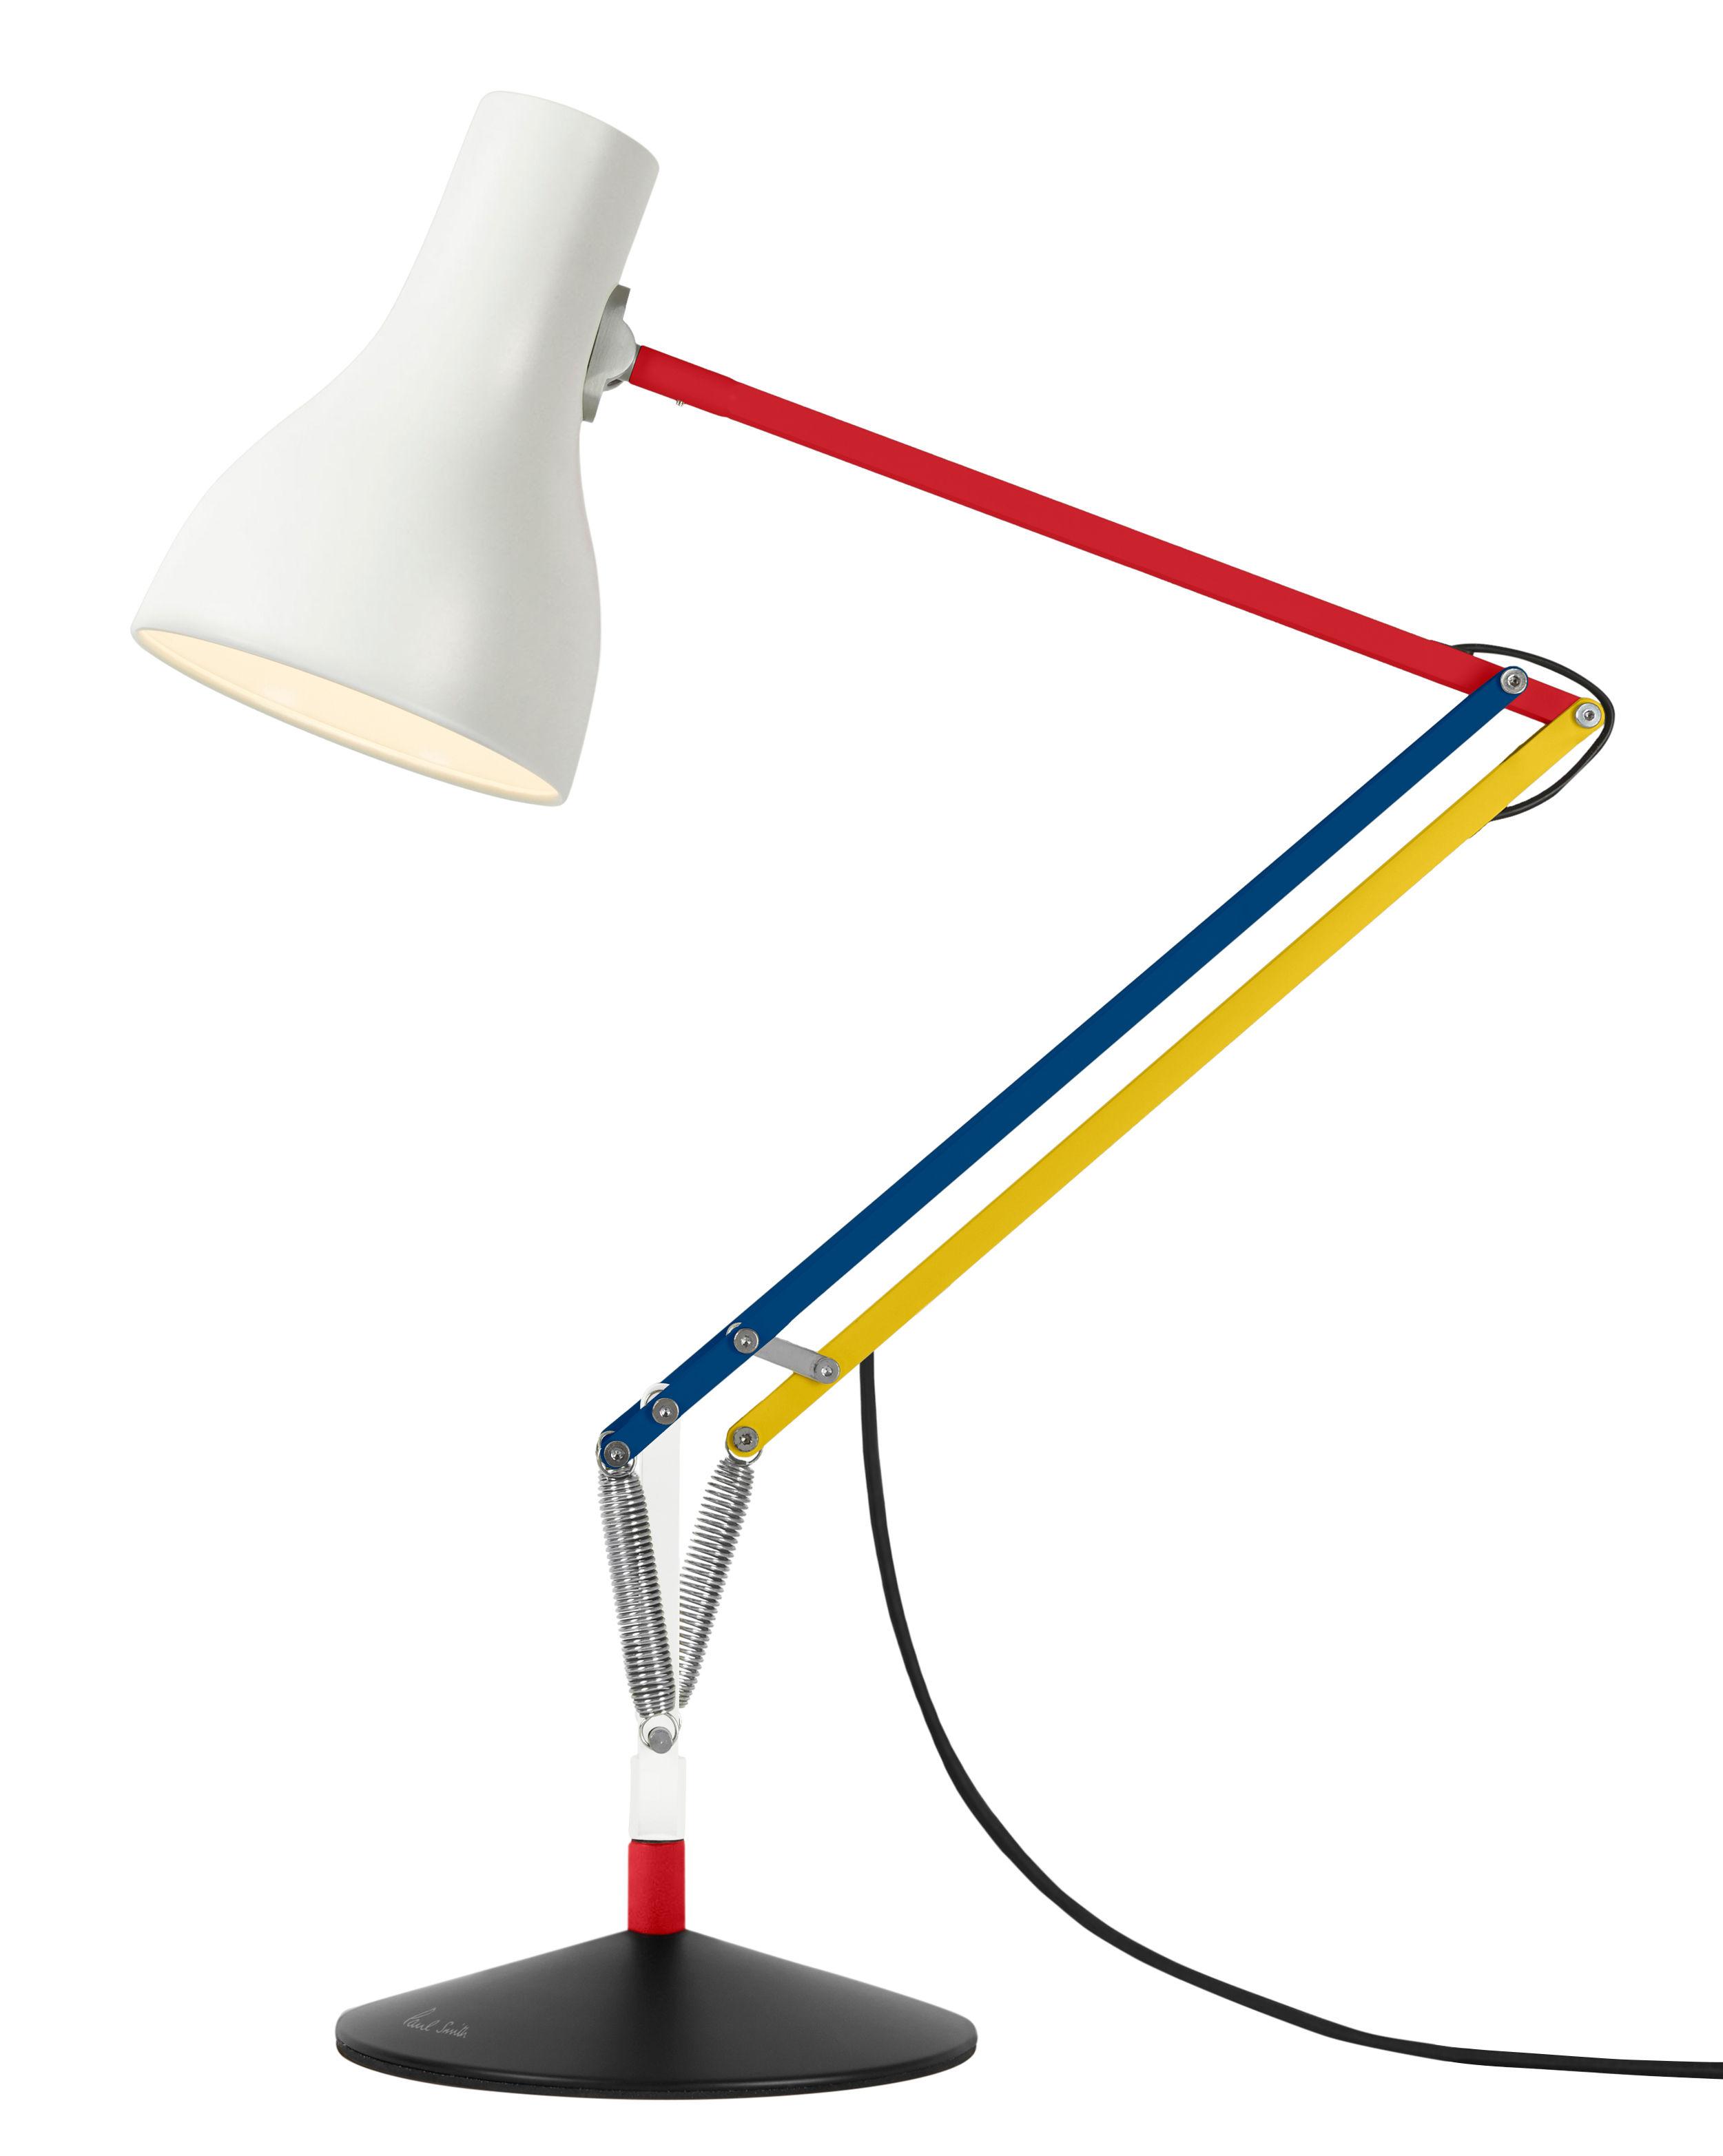 Lampe de table type 75 by paul smith edition n 3 rouge jaune bleu anglepoise - Luminaire industriel la giant collection par anglepoise ...